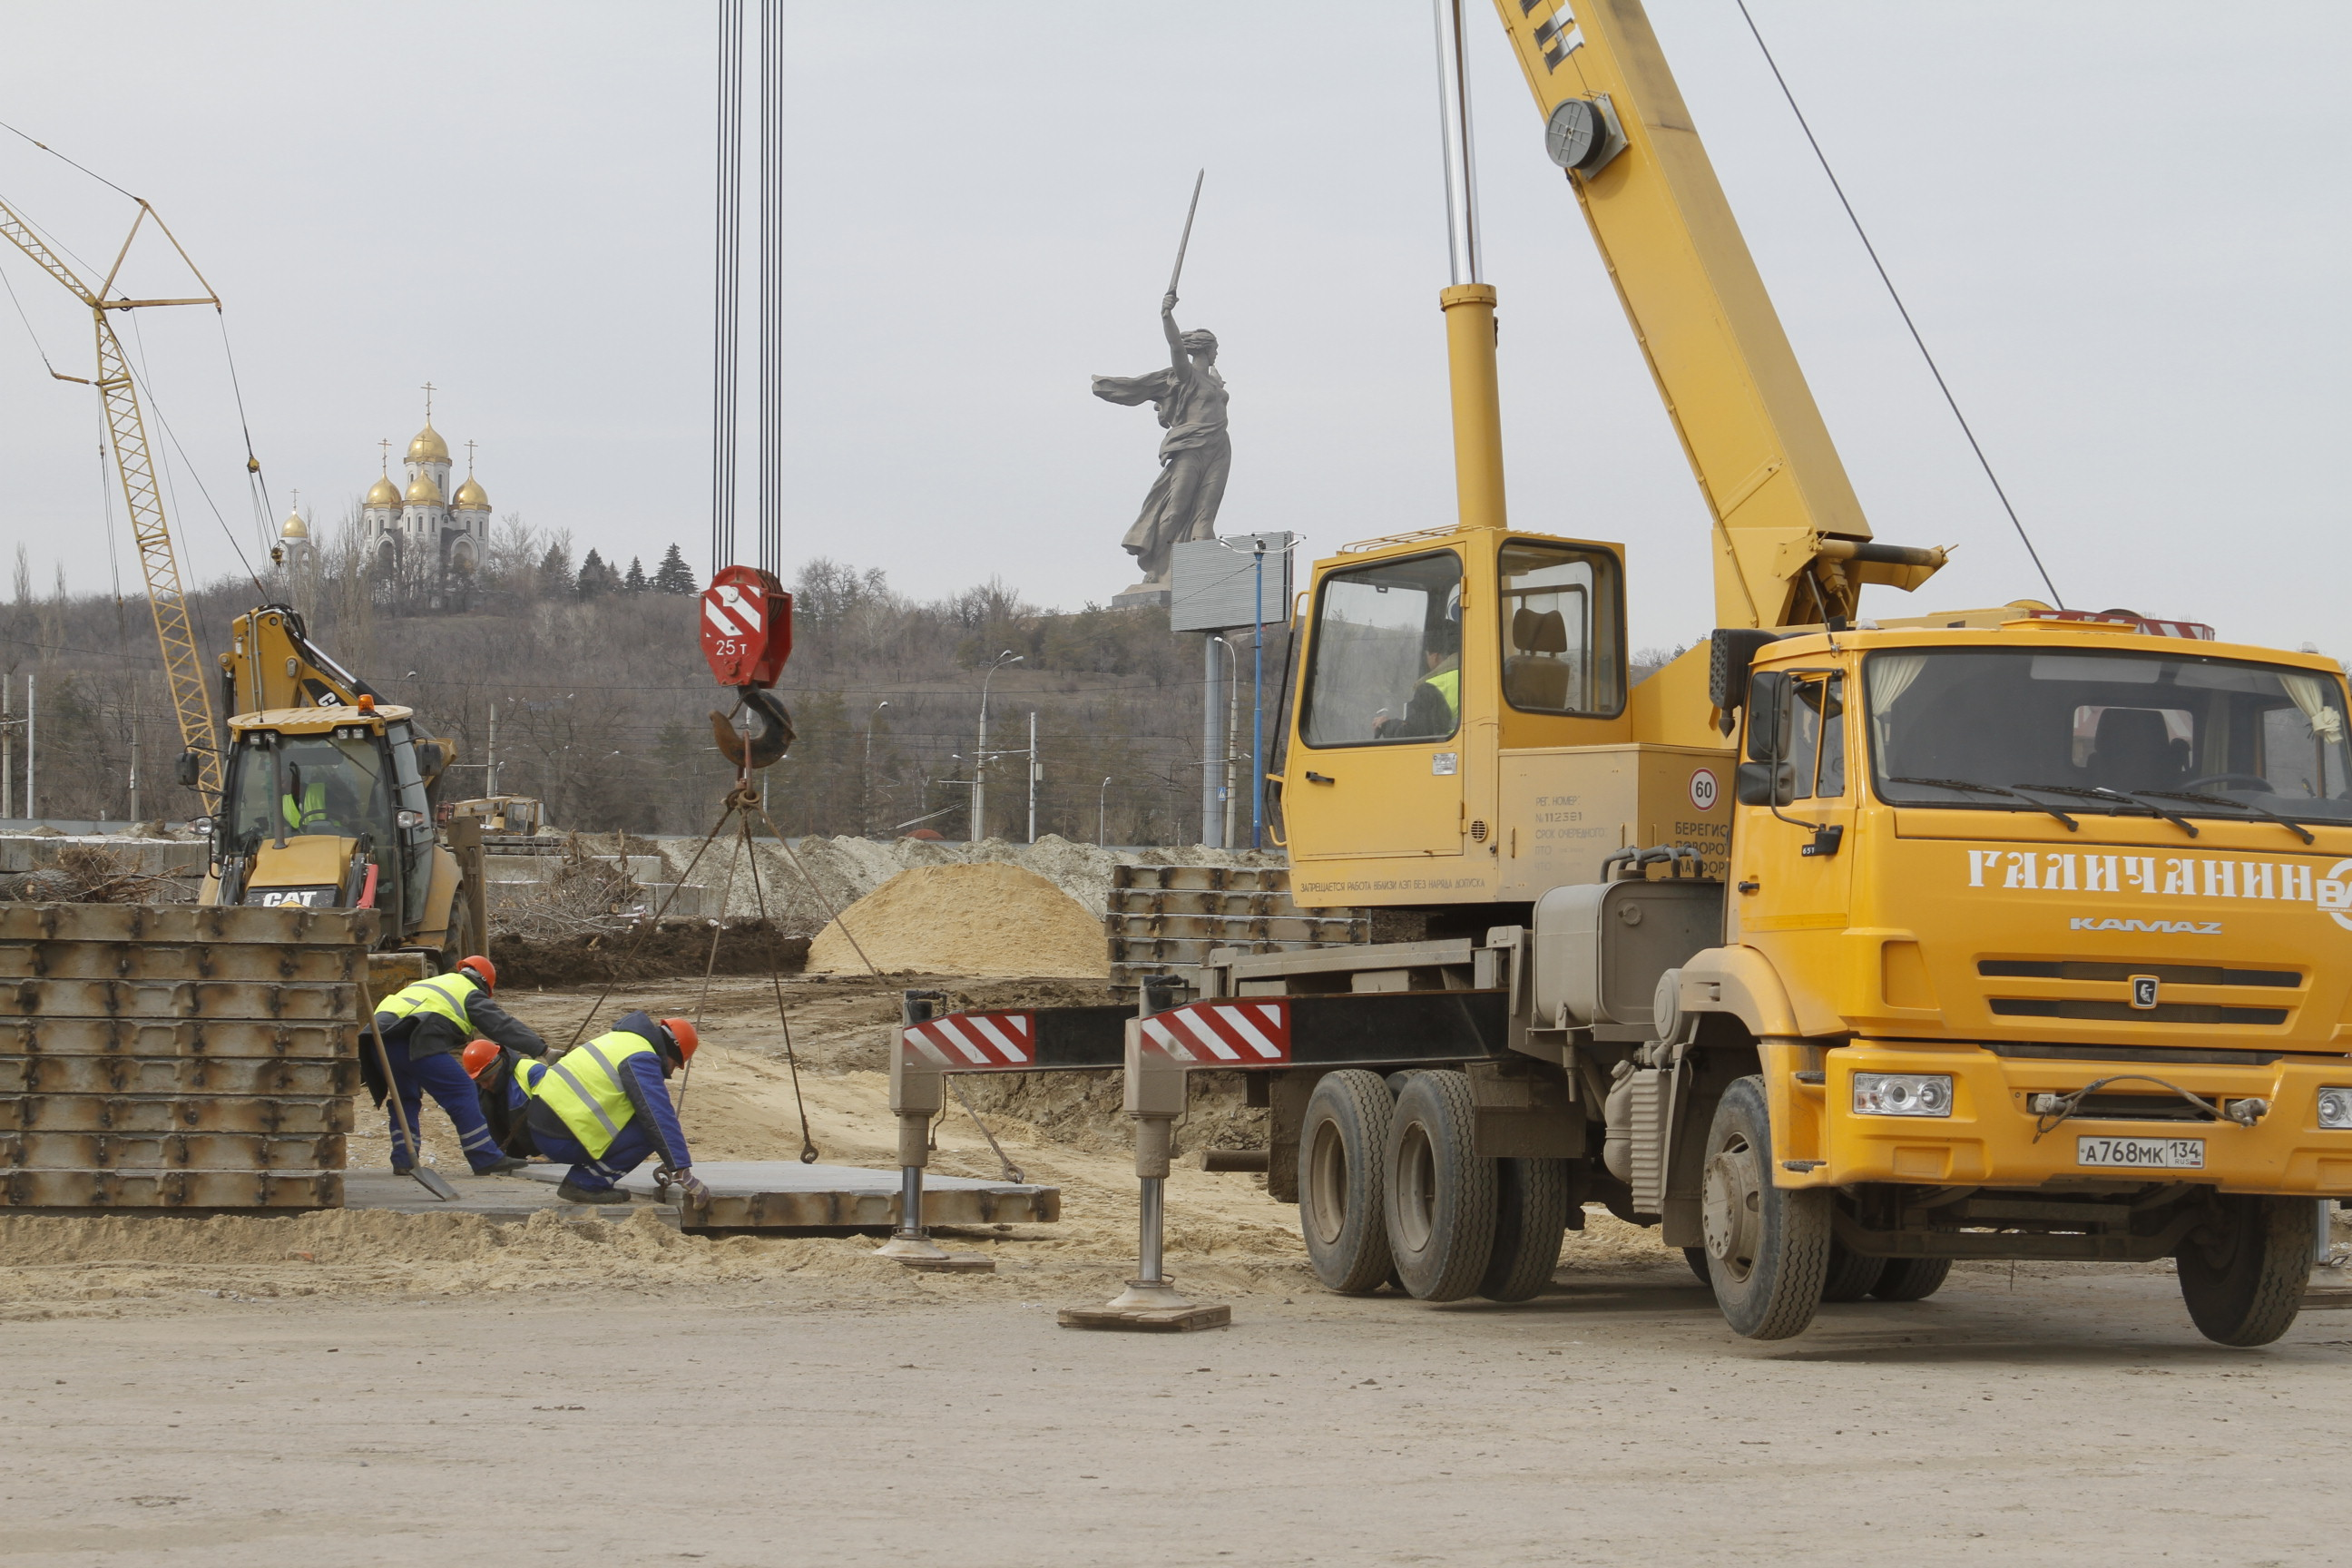 filekamaz crane truck galichanin ks557131 in